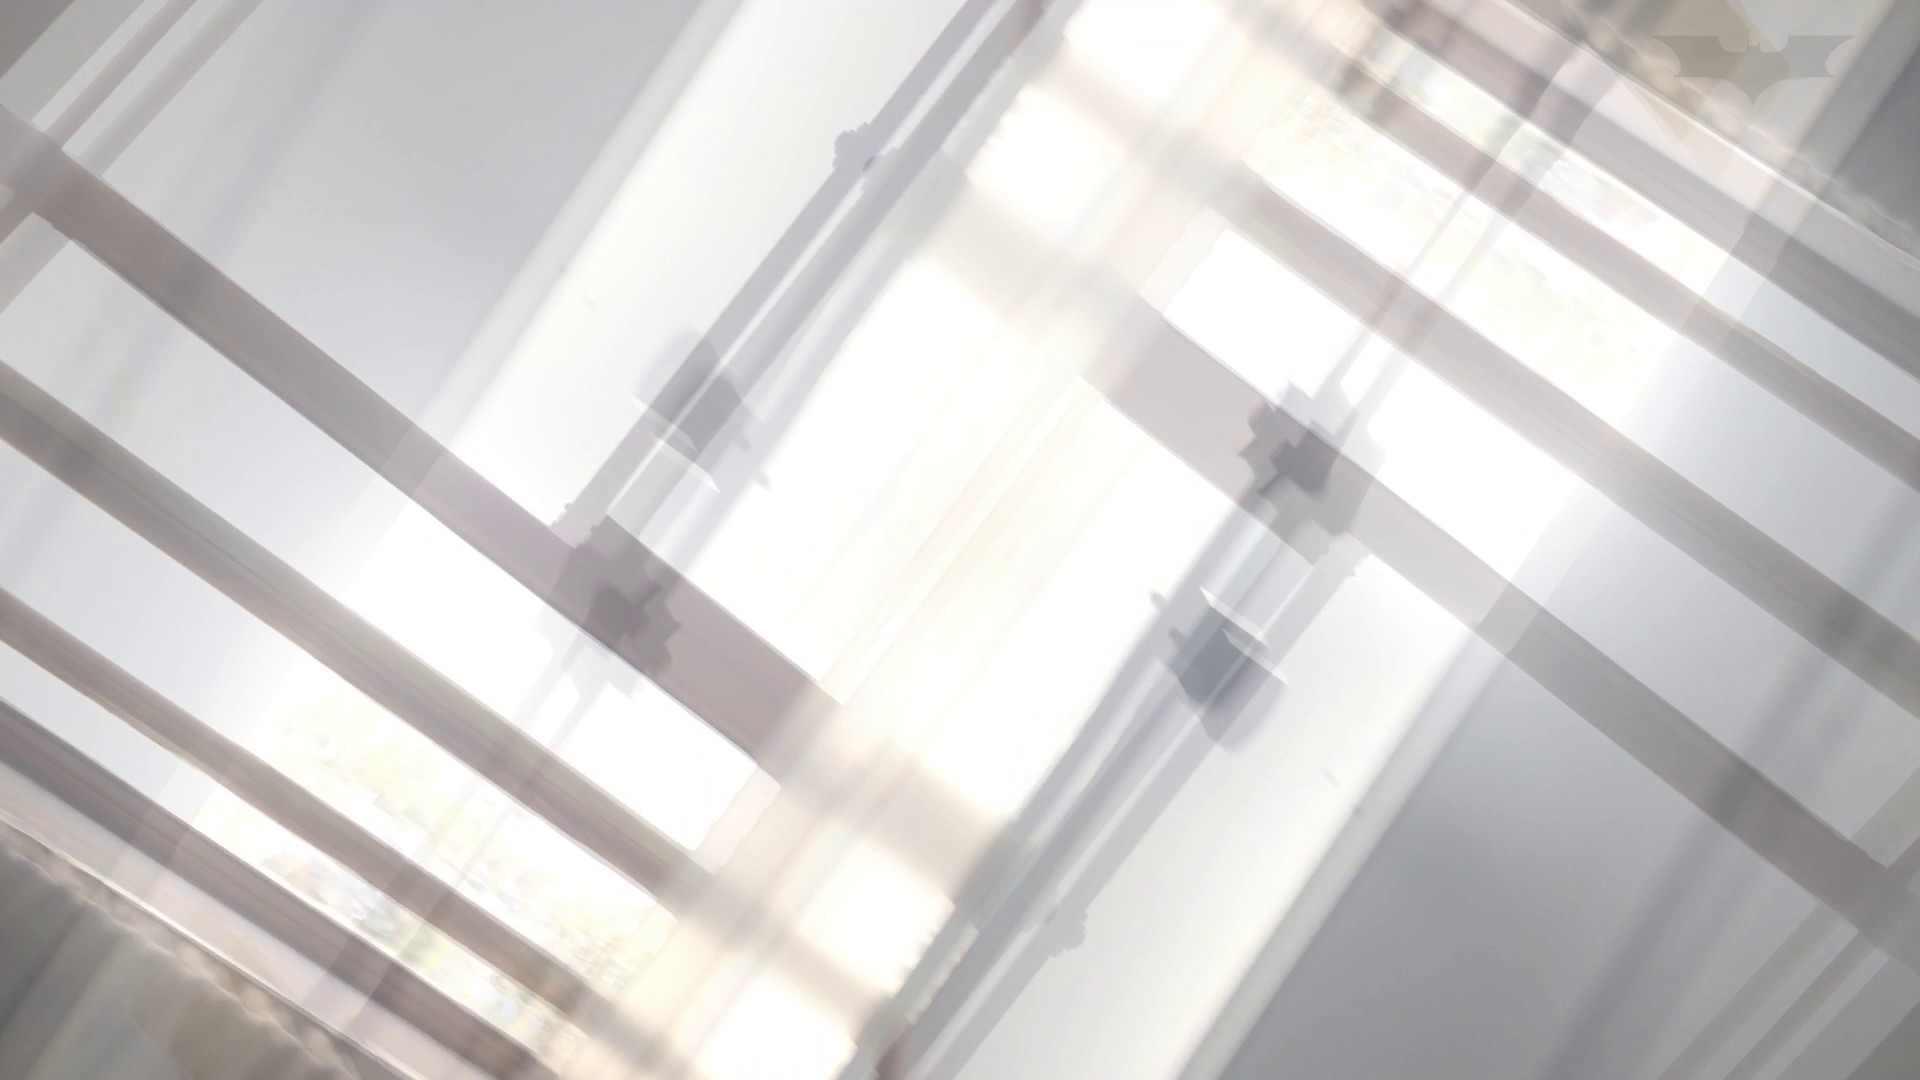 芸術大学ガチ潜入盗撮 JD盗撮 美女の洗面所の秘密 Vol.82 高画質 戯れ無修正画像 73画像 68